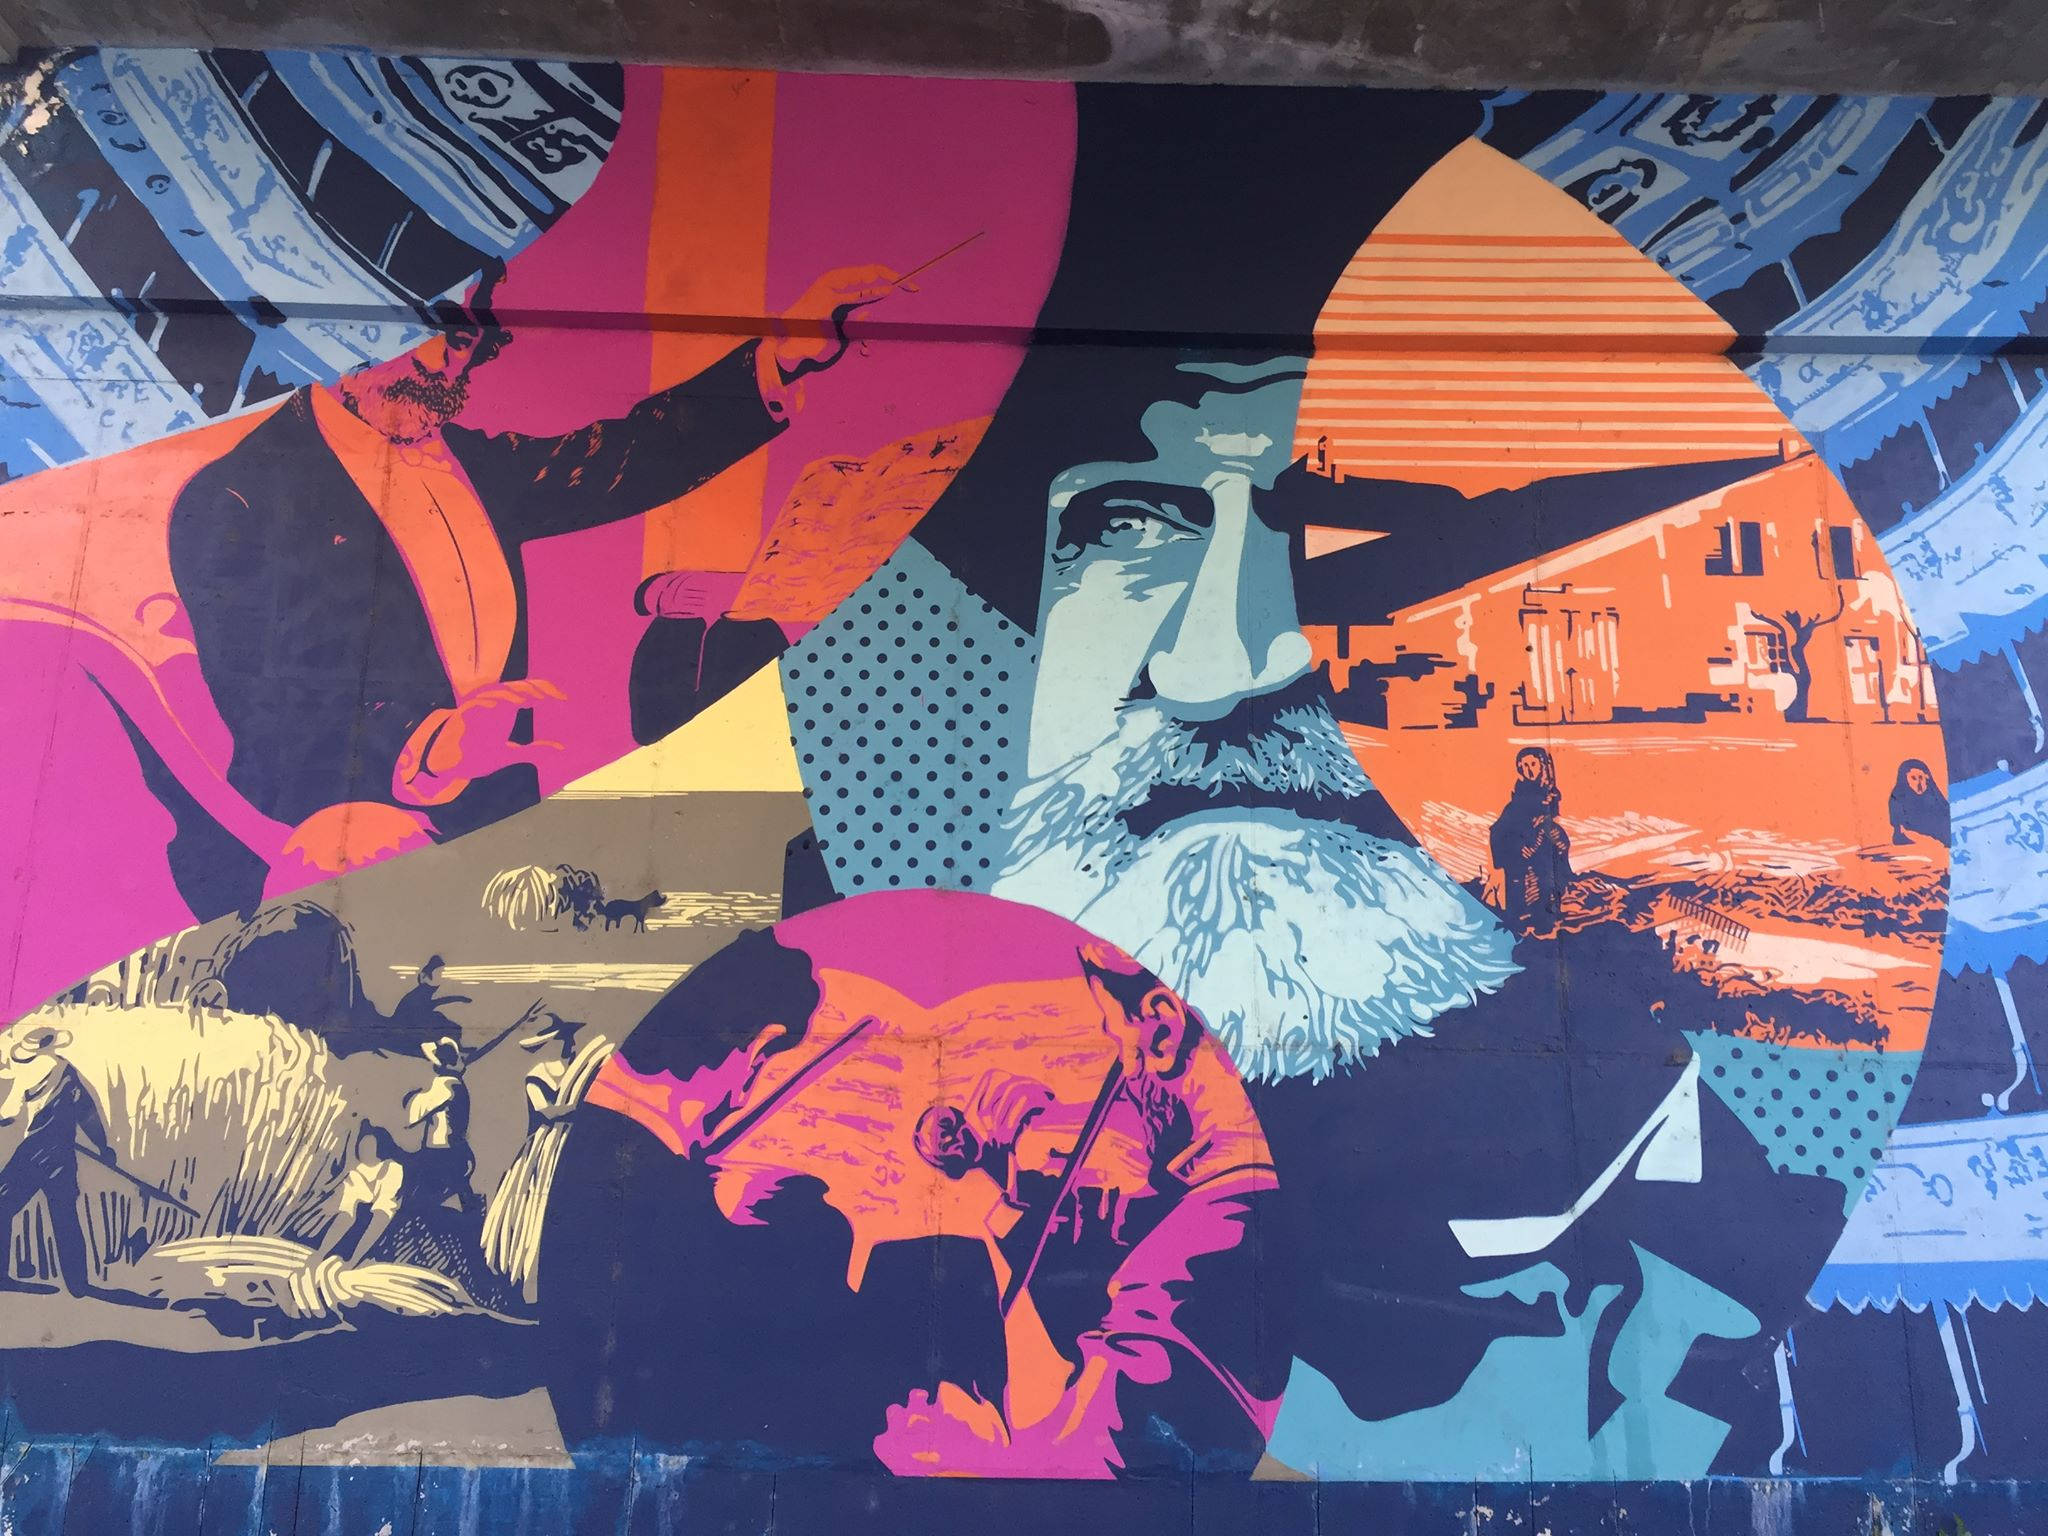 STREET VIEW : les fresques murales - MONDE (hors France) - Page 25 69056910